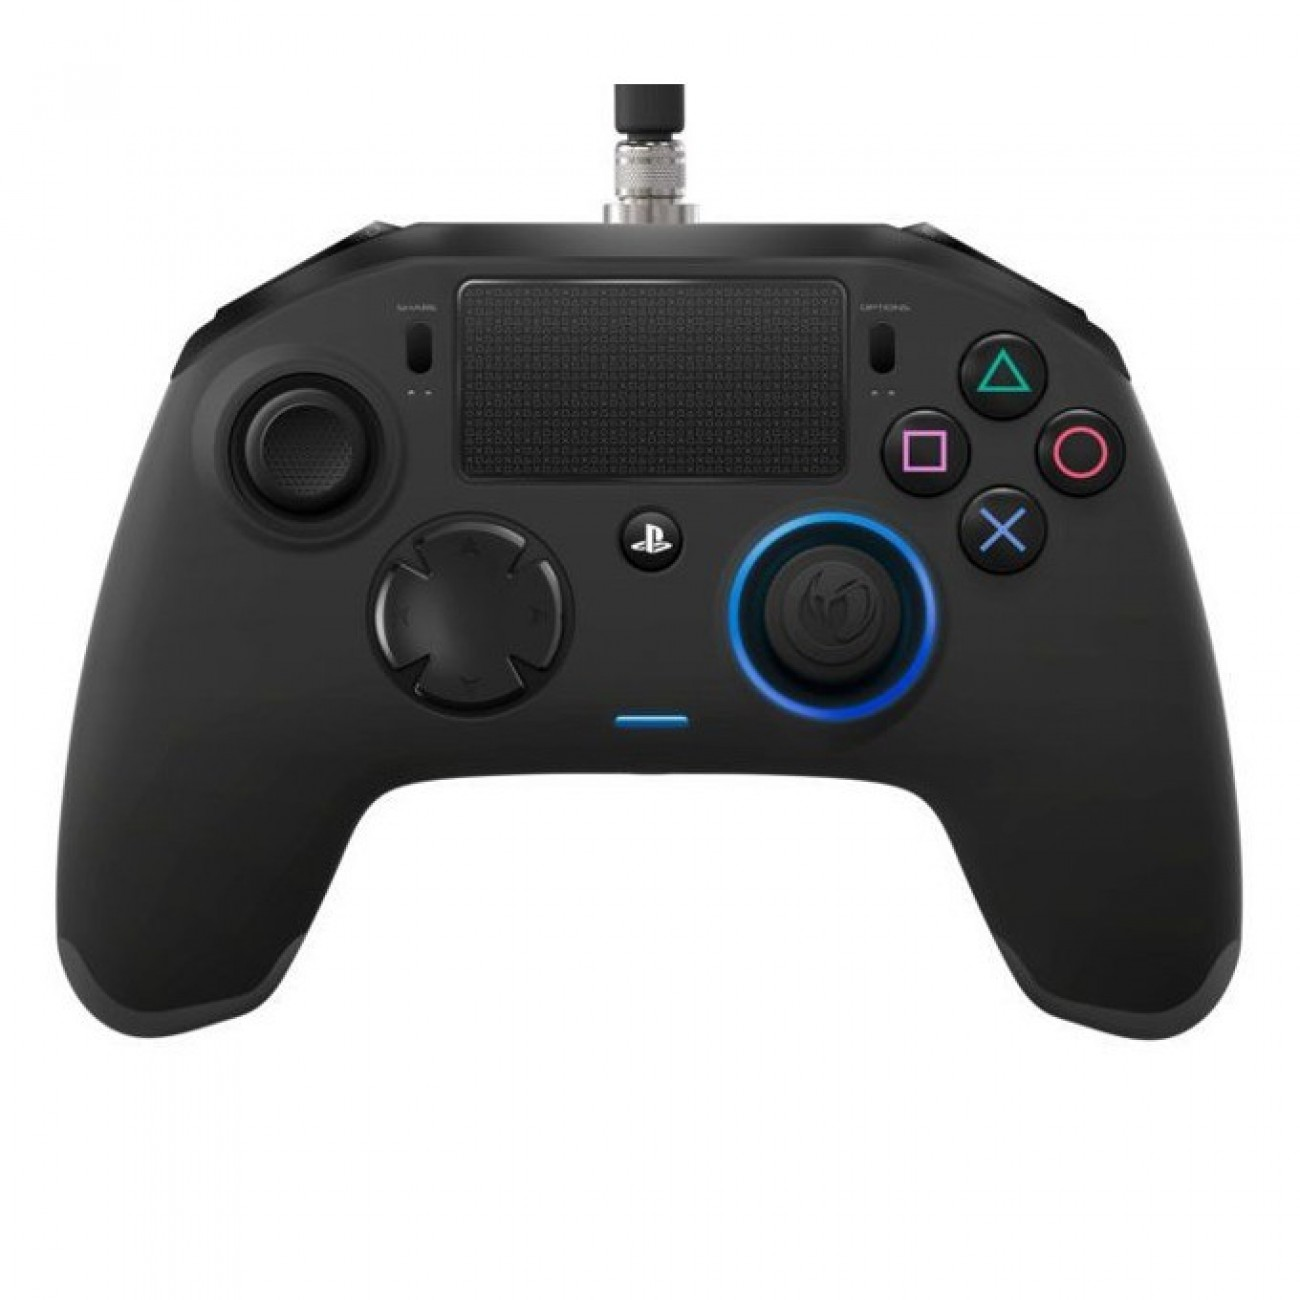 Геймпад Nacon Revolution Pro, за PS4, черен в Геймпади, Волани, Джойстици - Nacon | Alleop